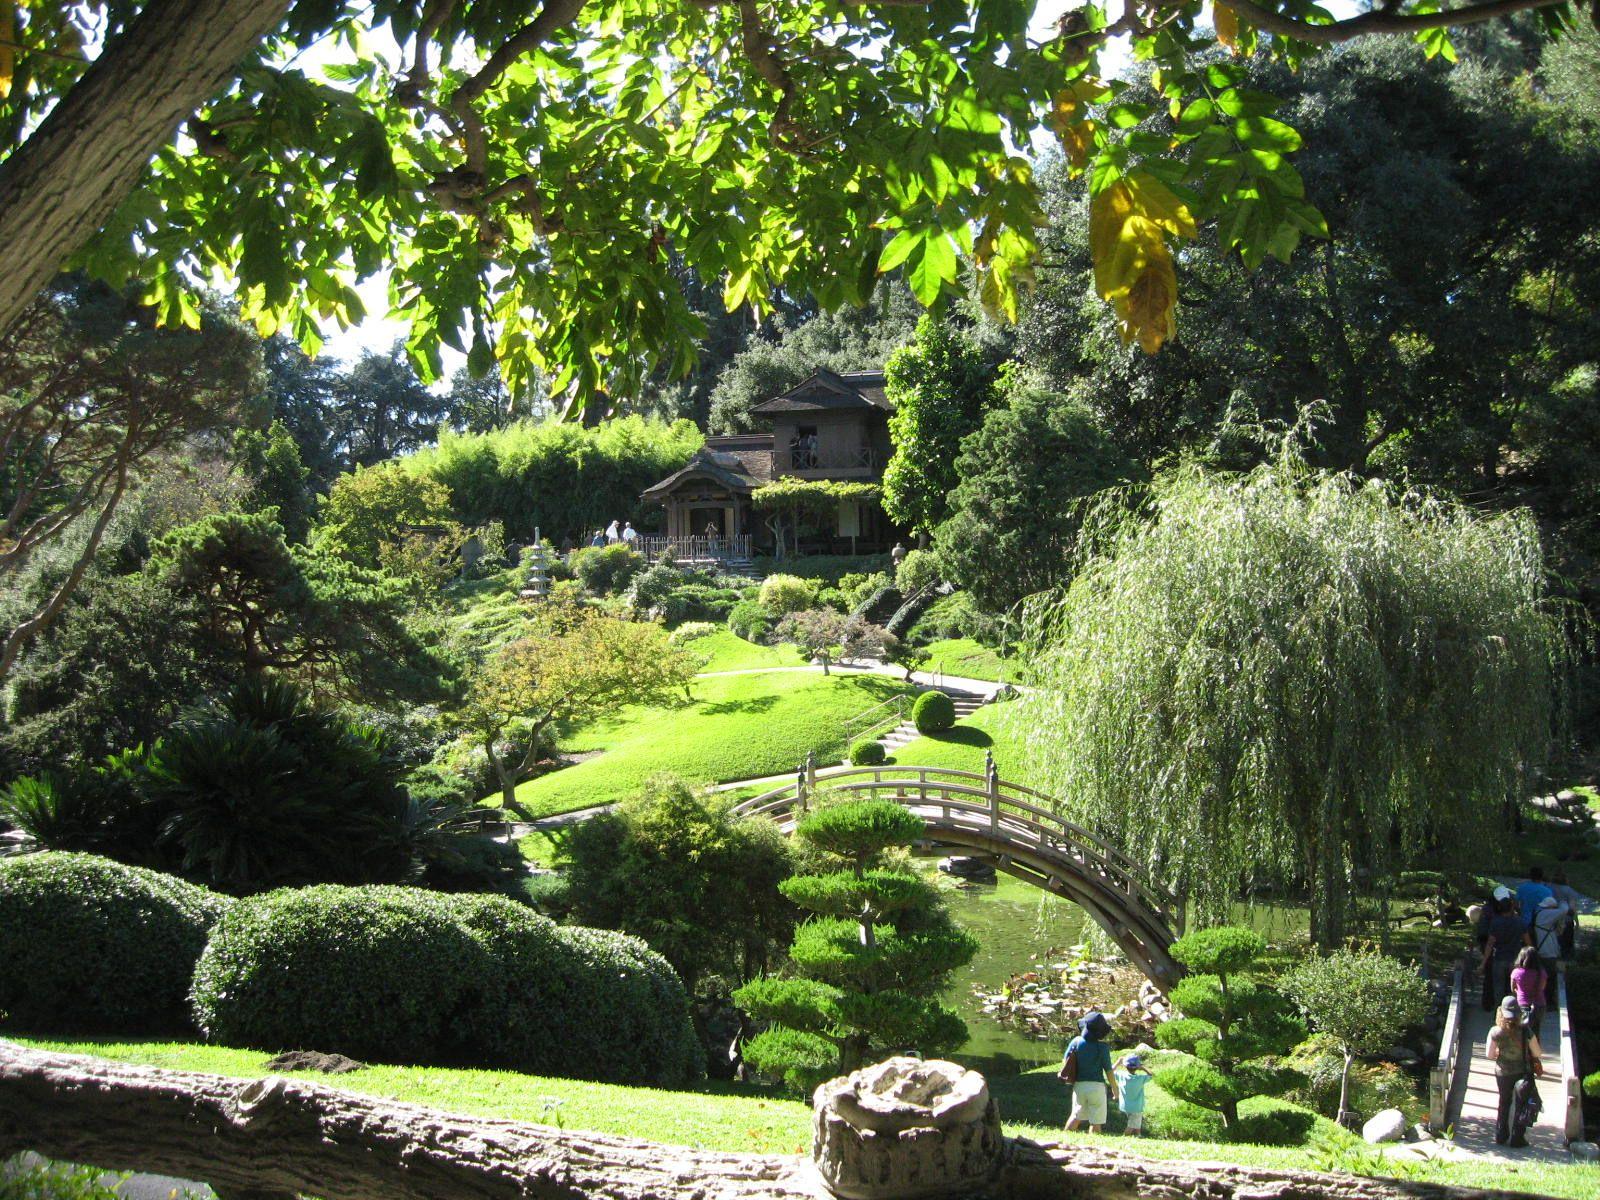 Japanese Garden At The Hunnington Library Gardens, San Marino (Near